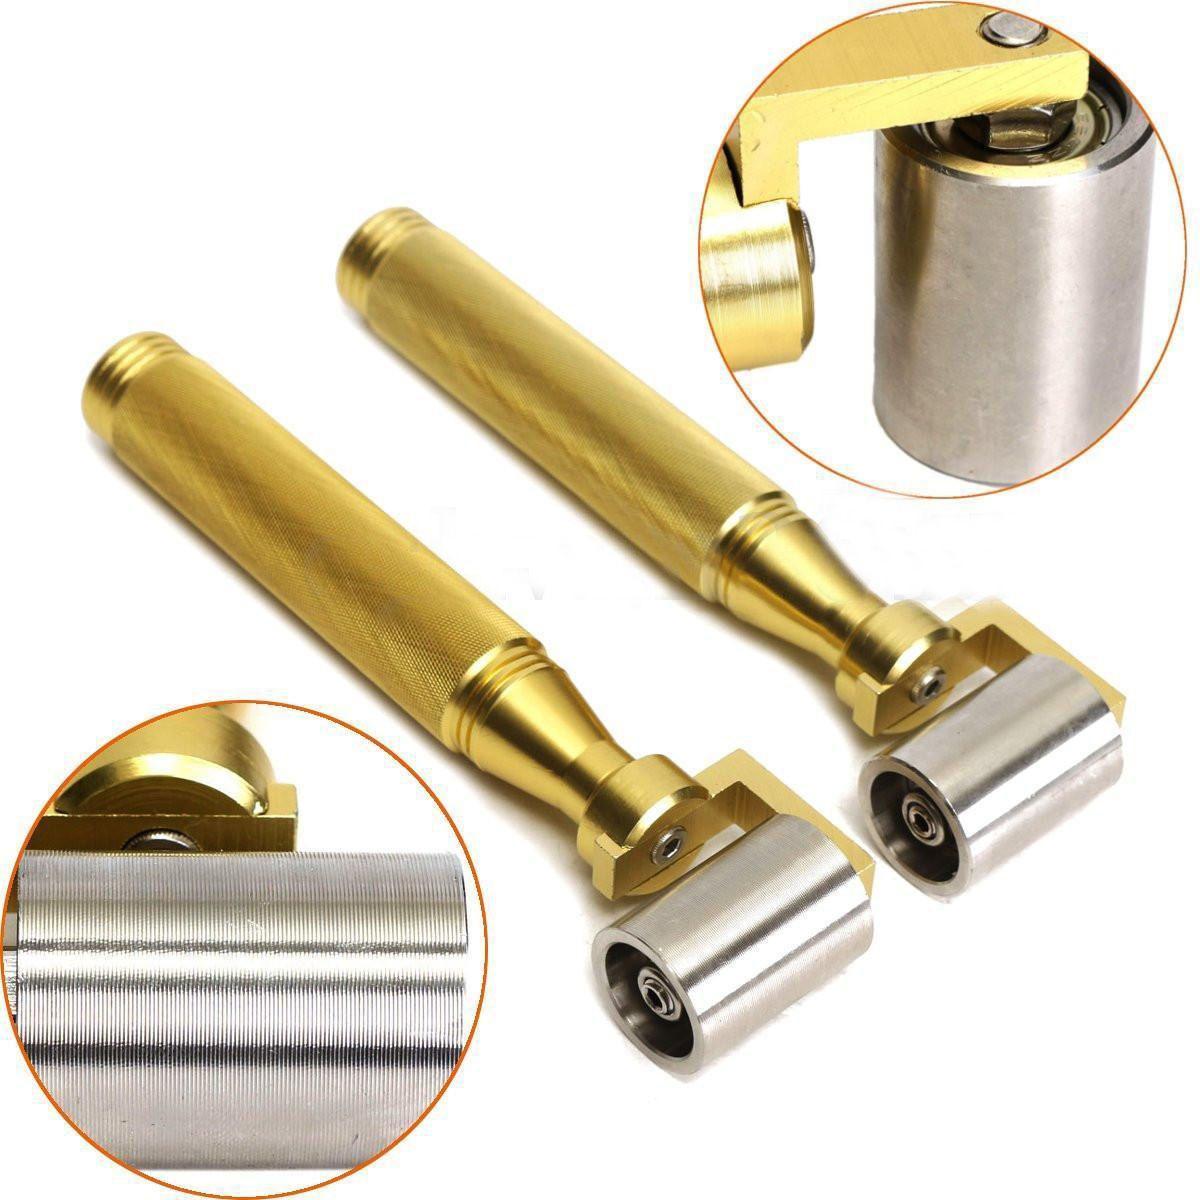 Golden Stainless Steel Handle Wallpaper Seam Roller Seamed Wall